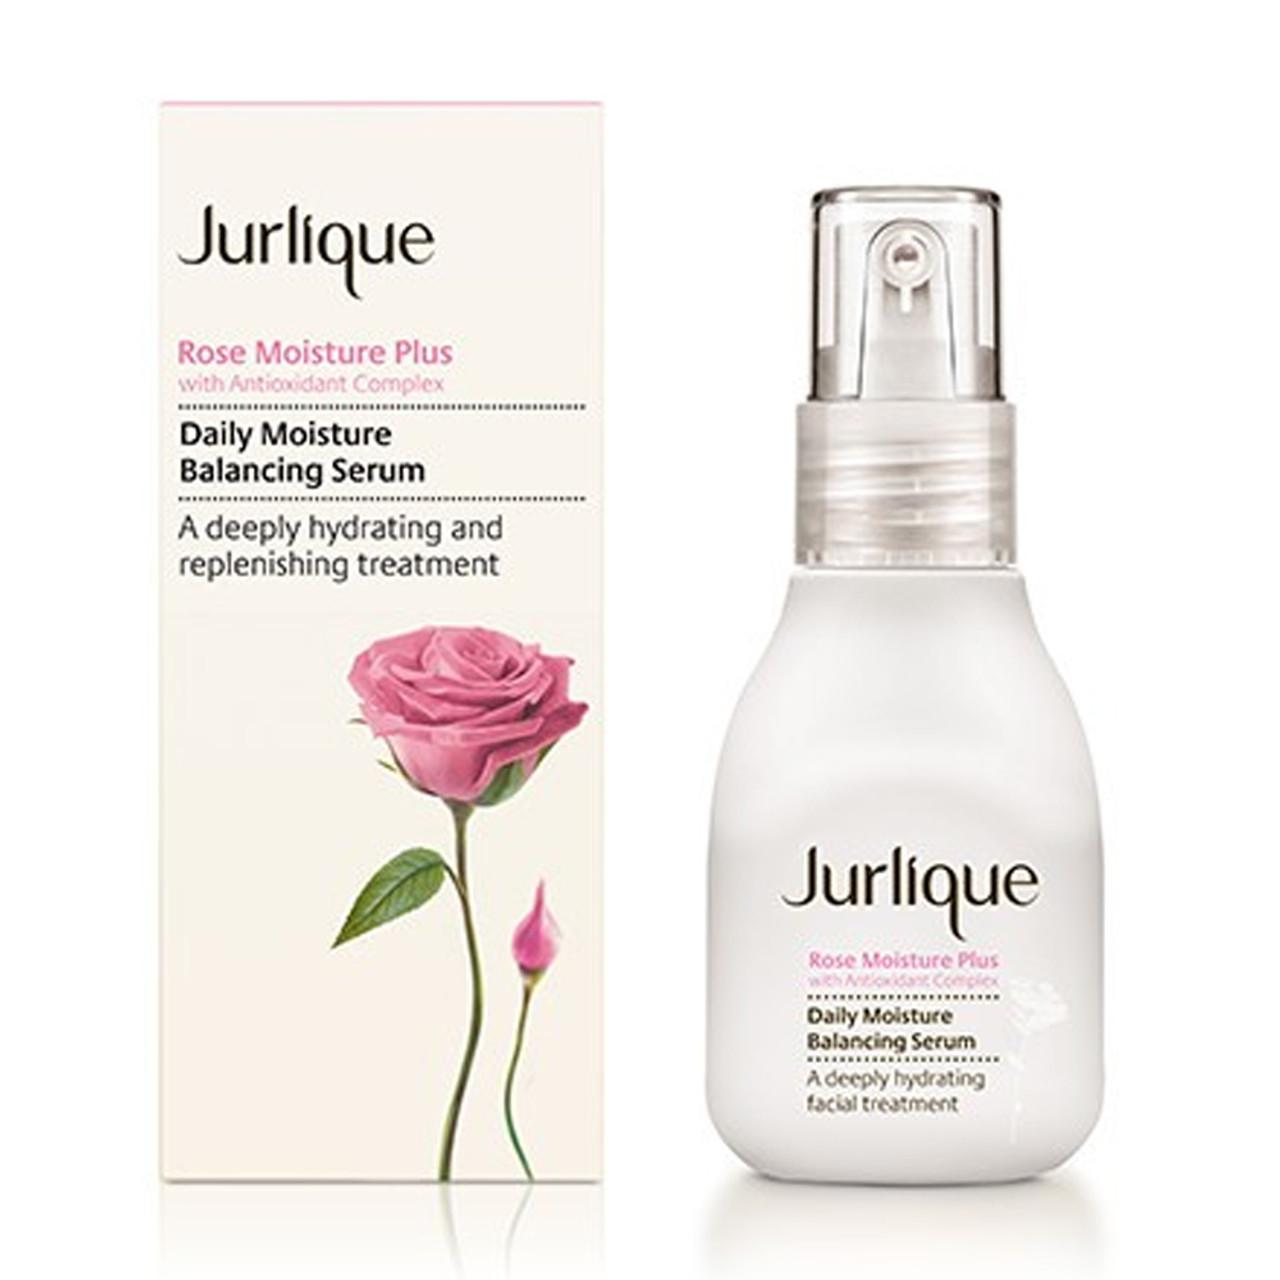 Jurlique Rose Moisture Plus Daily Moisture Balancing Serum(discontinued) BeautifiedYou.com